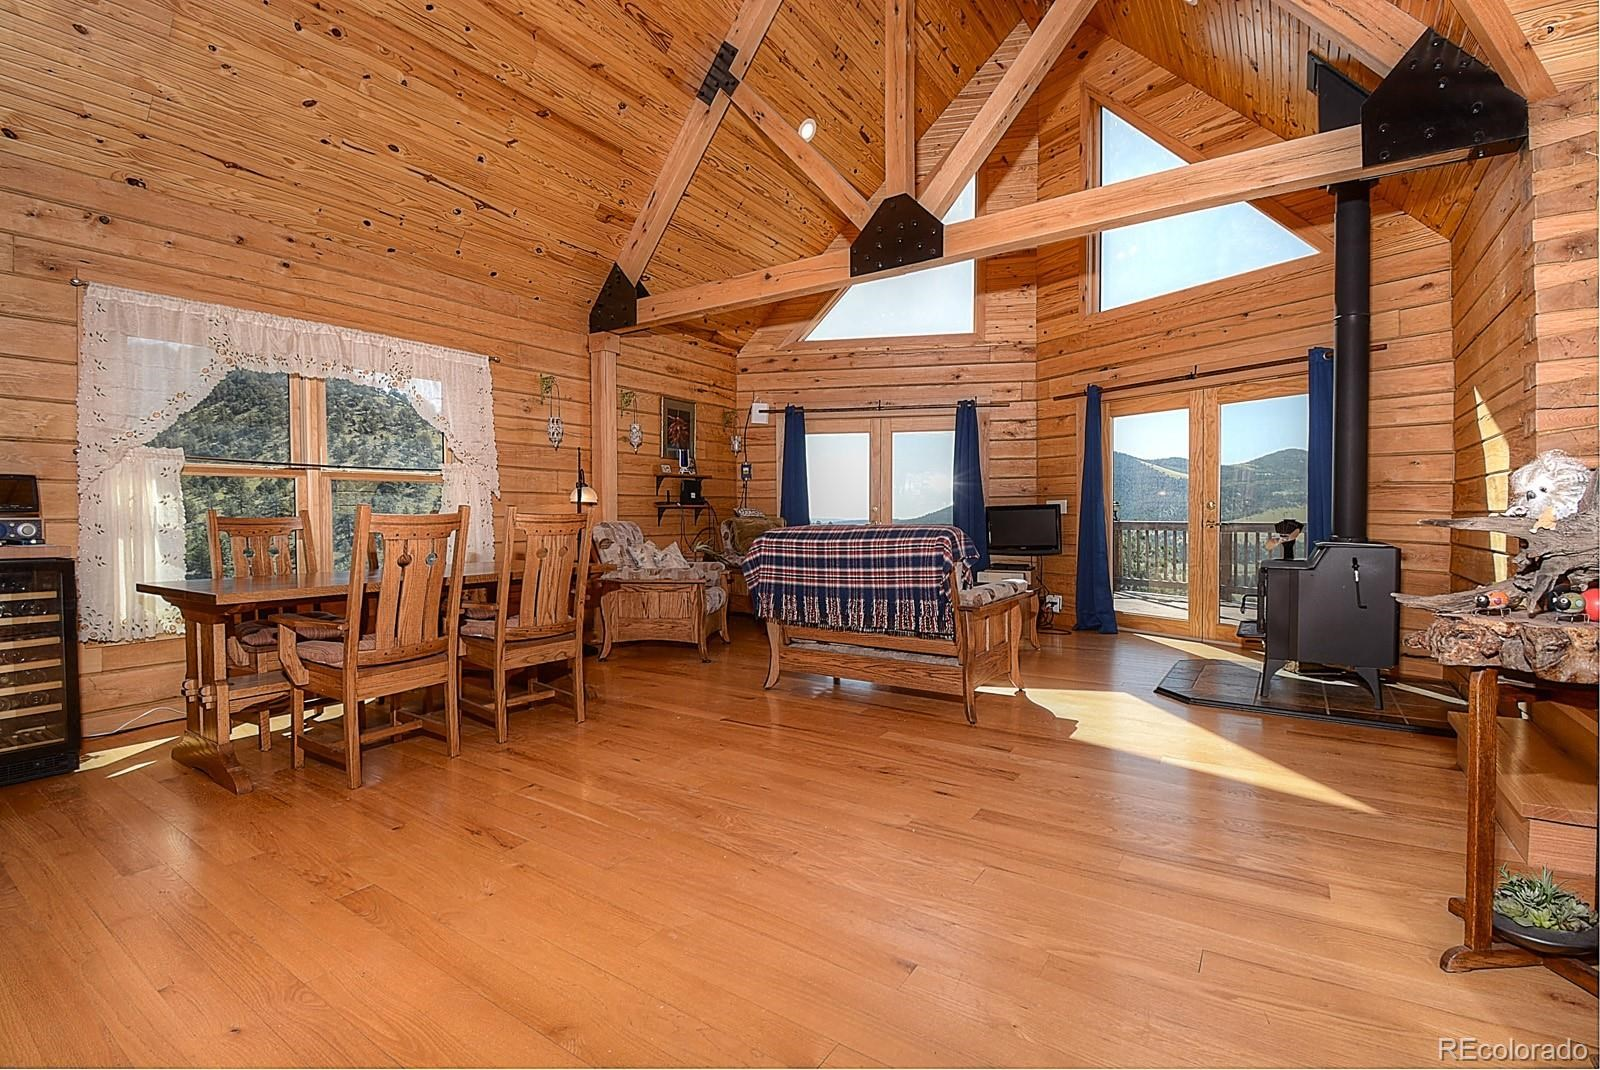 MLS# 8182693 - 9 - 396 Eagle Nest Trail, Guffey, CO 80820